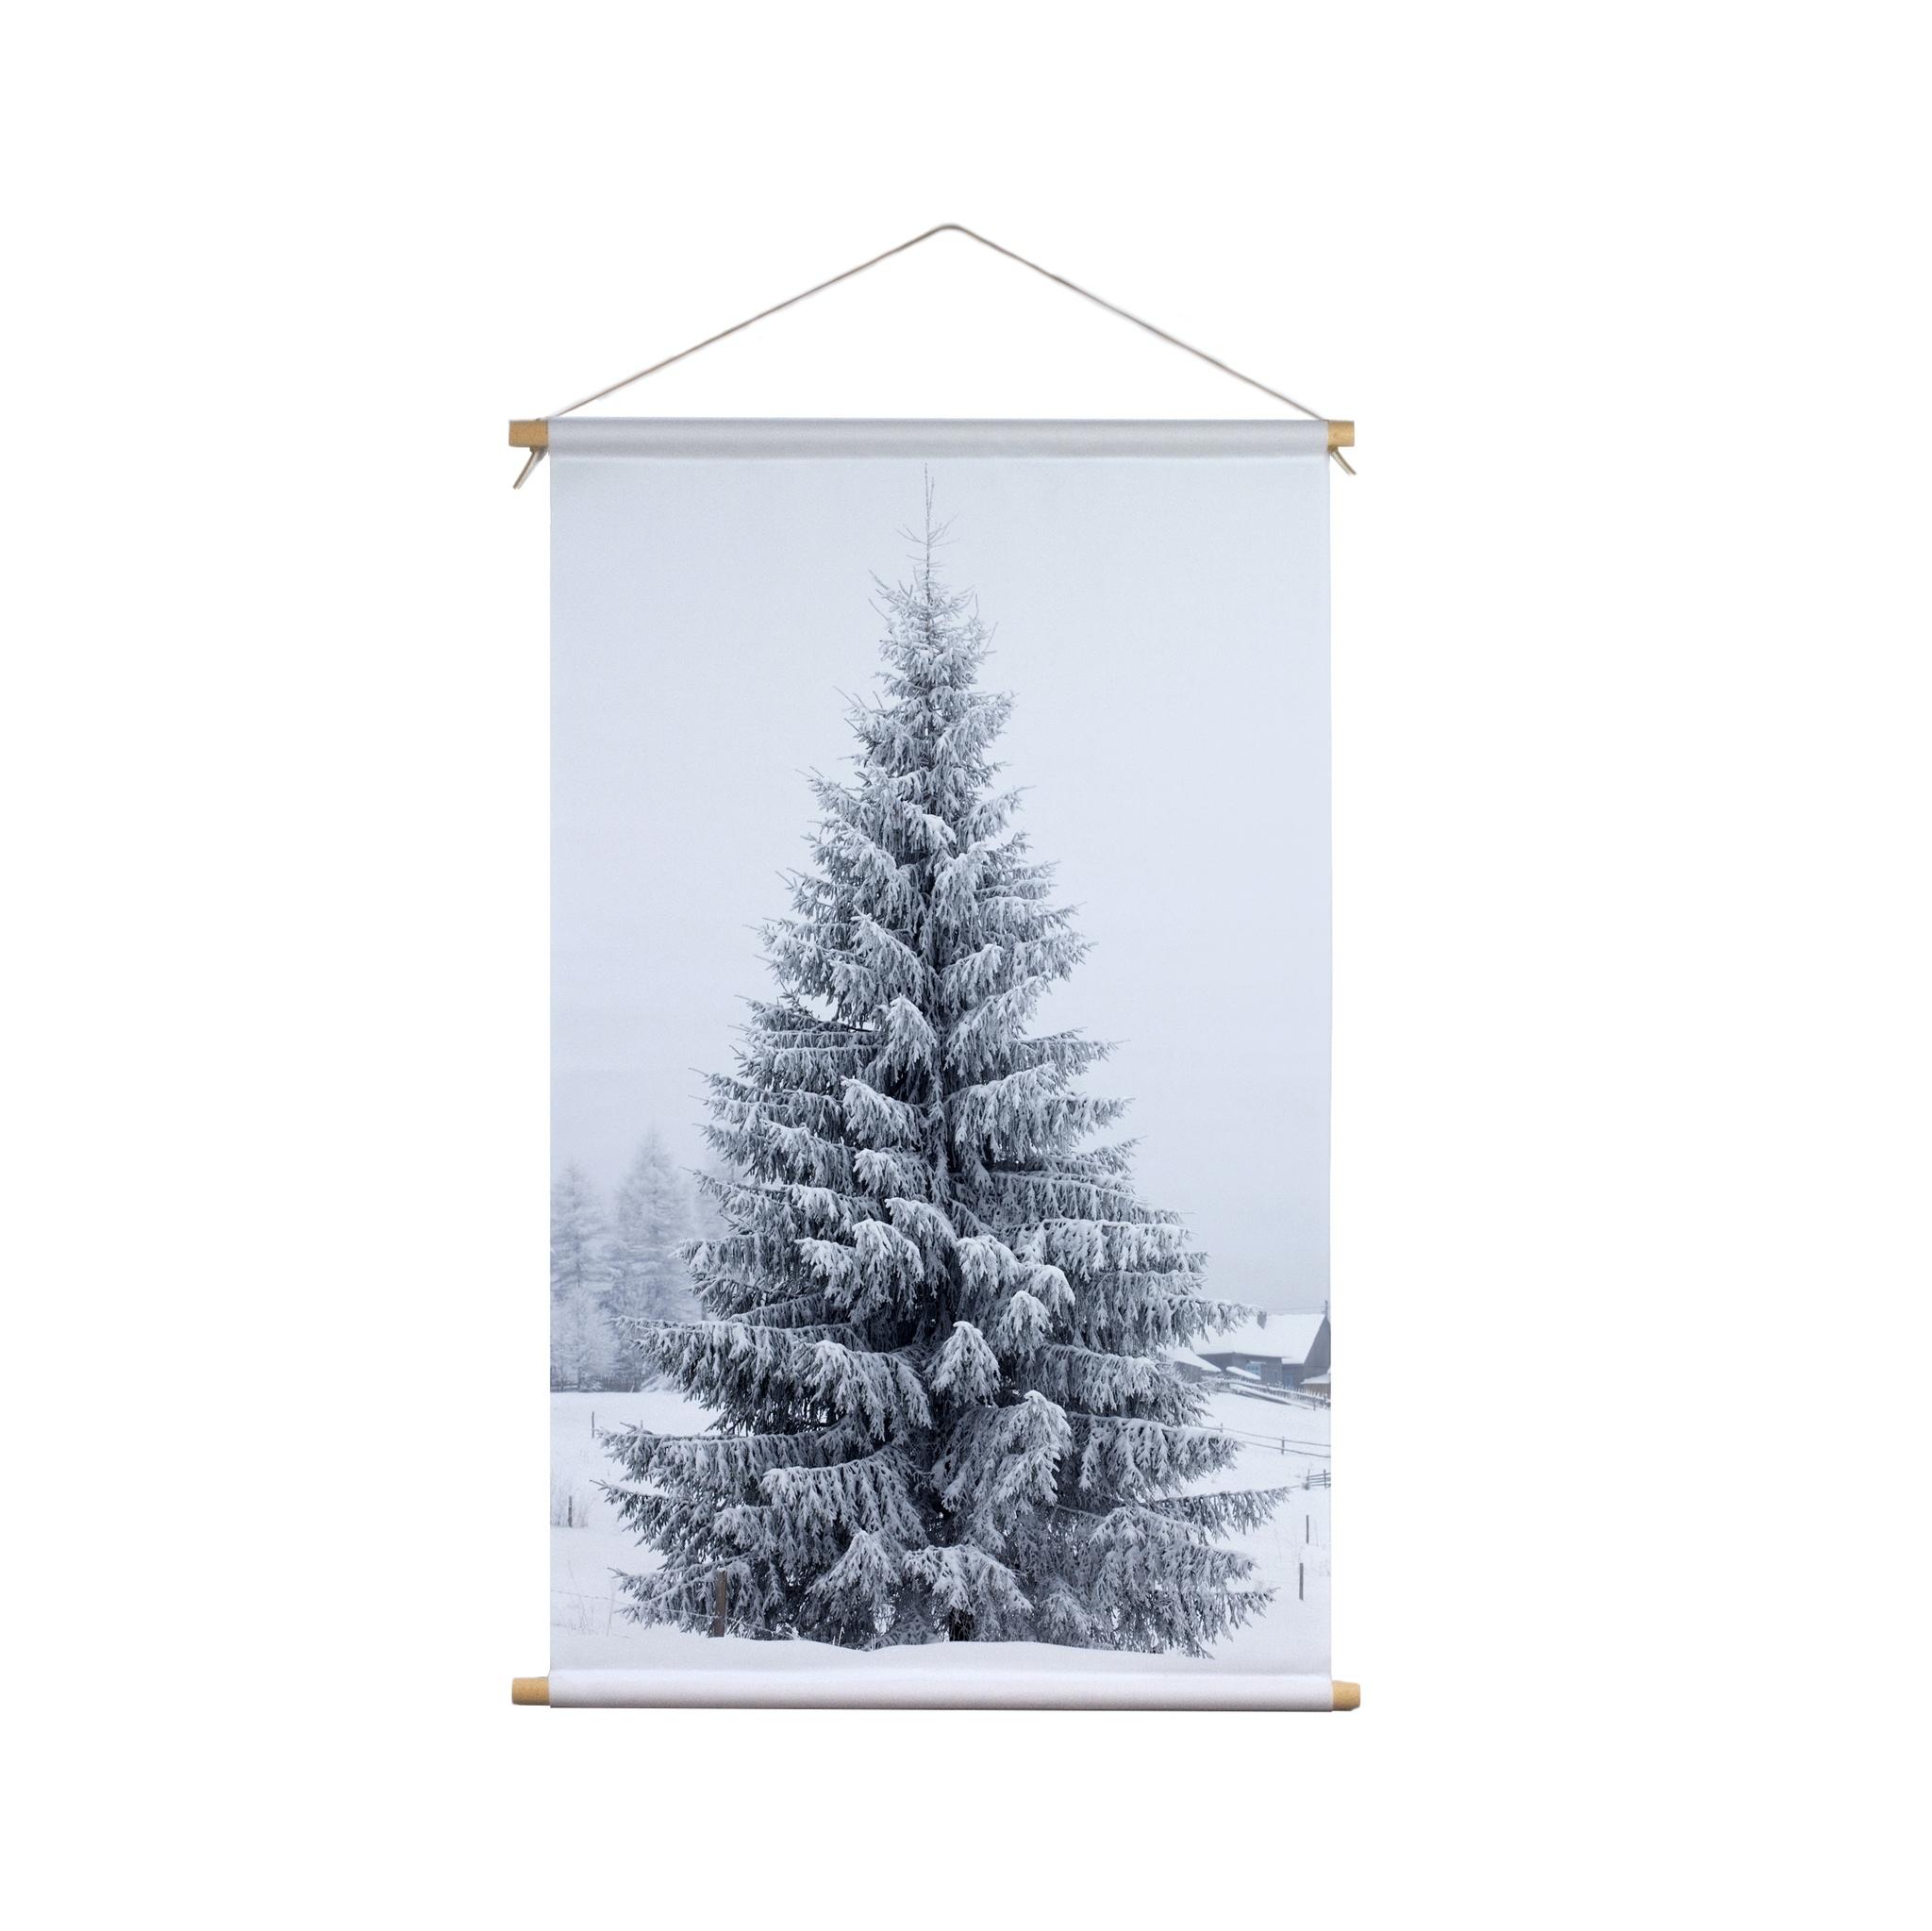 Signcraft-rotterdam_interieur-kerst-textielposter-print-kerstboom-natuur-wit